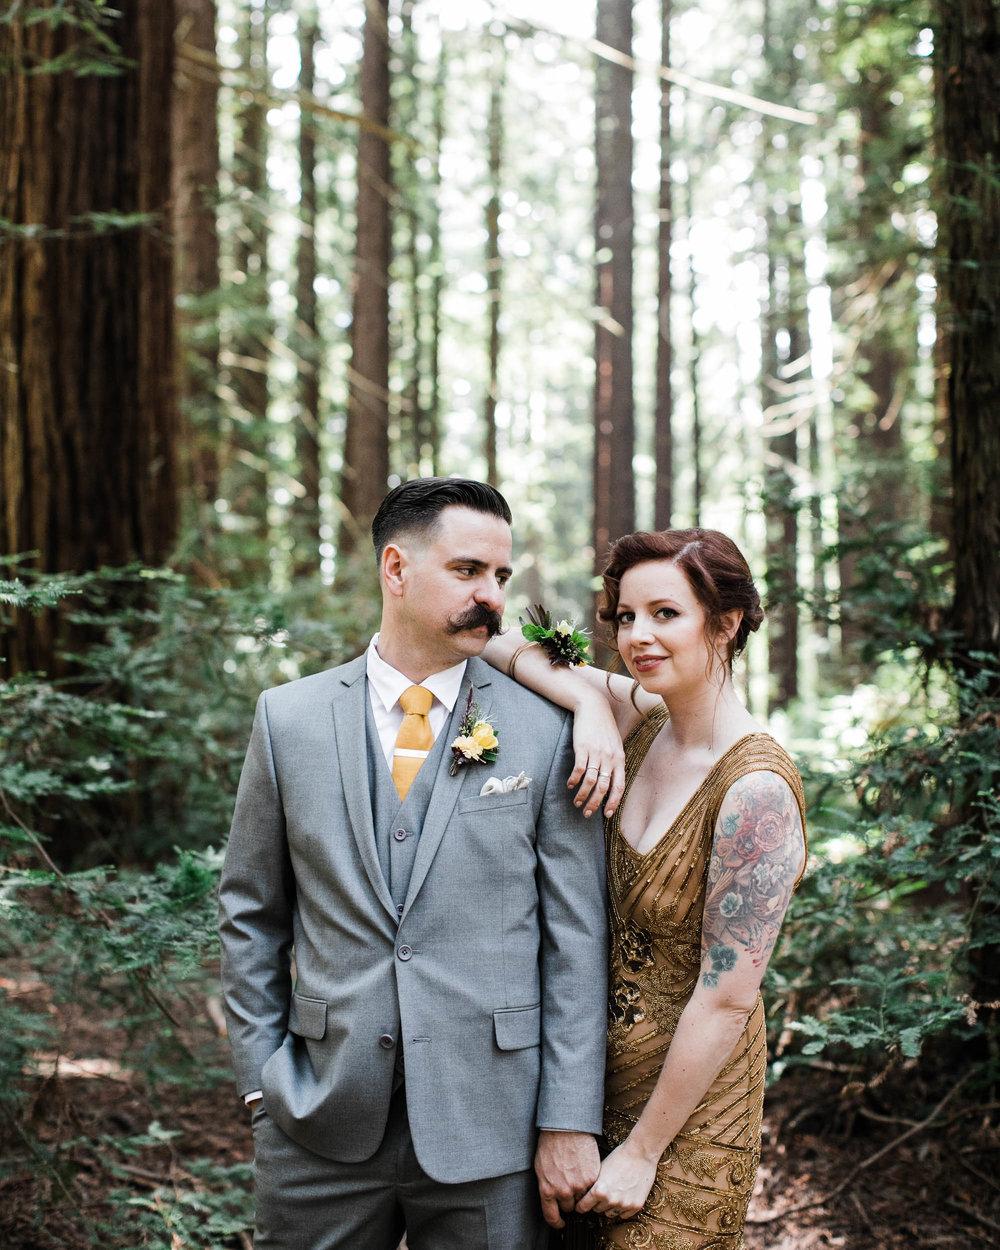 John + Stephanie | Oakland